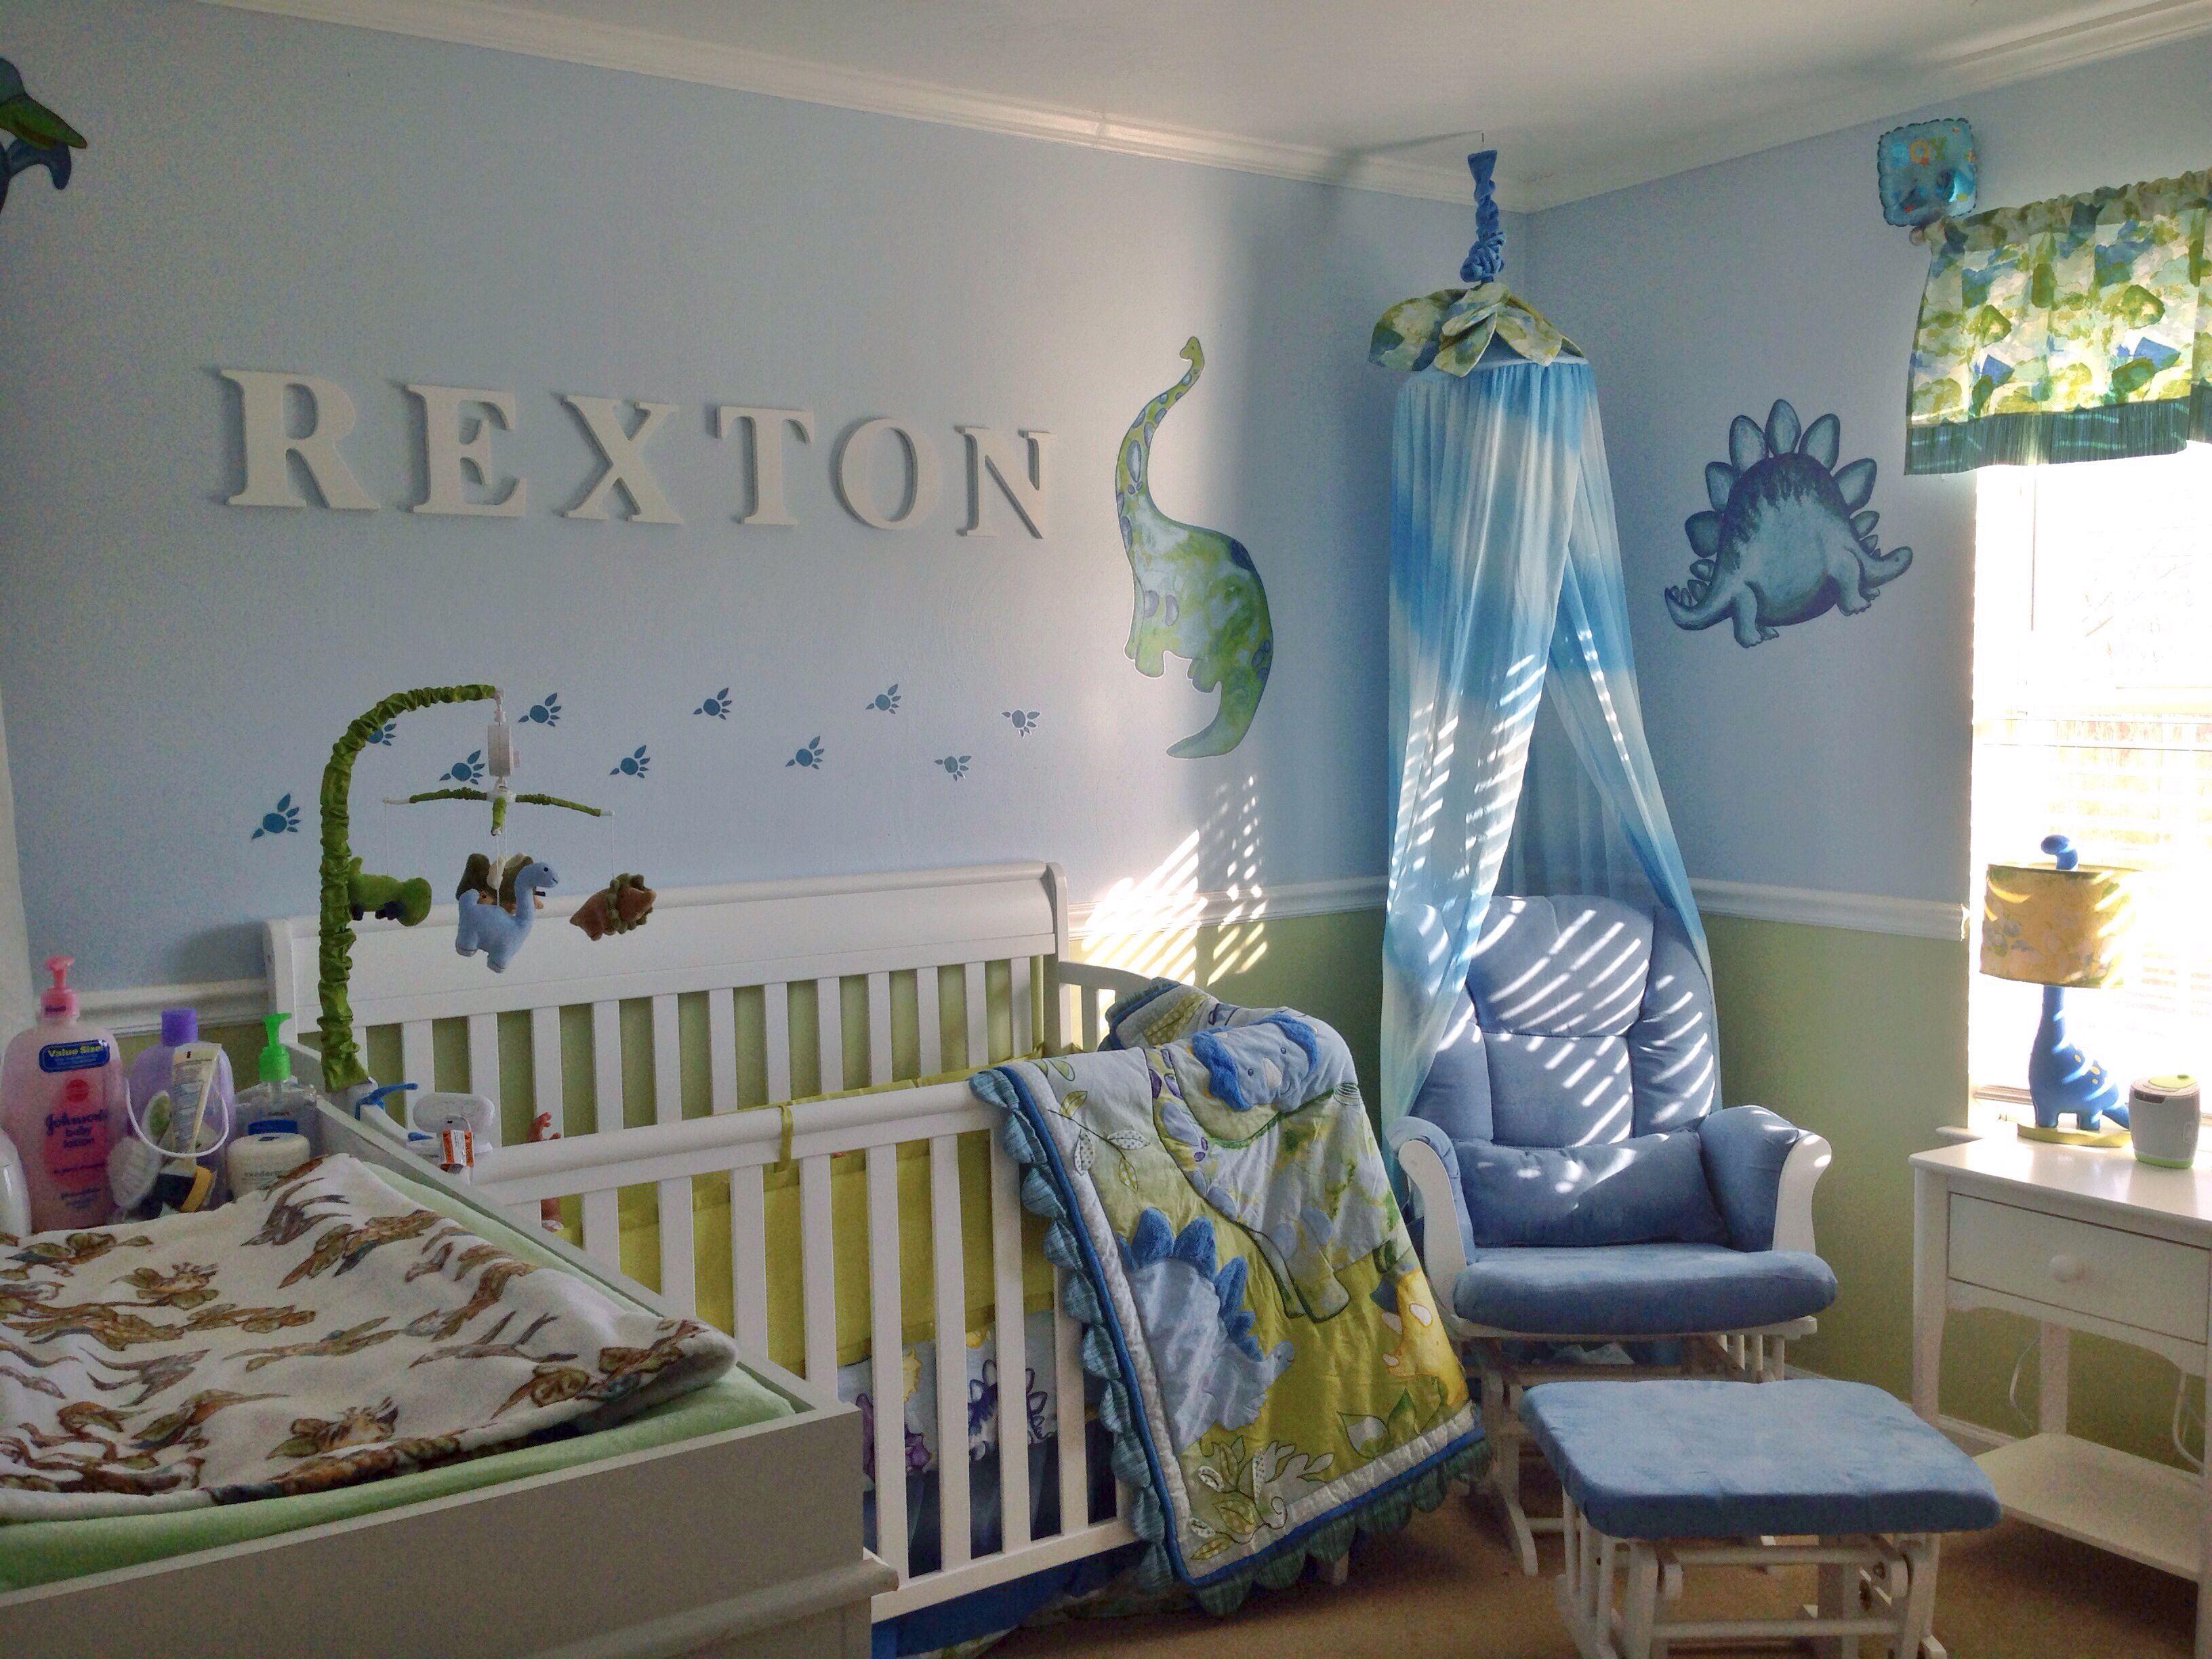 Rexton s nursery =] Heidi Klum s Truly Scrumptious Dinosaur theme